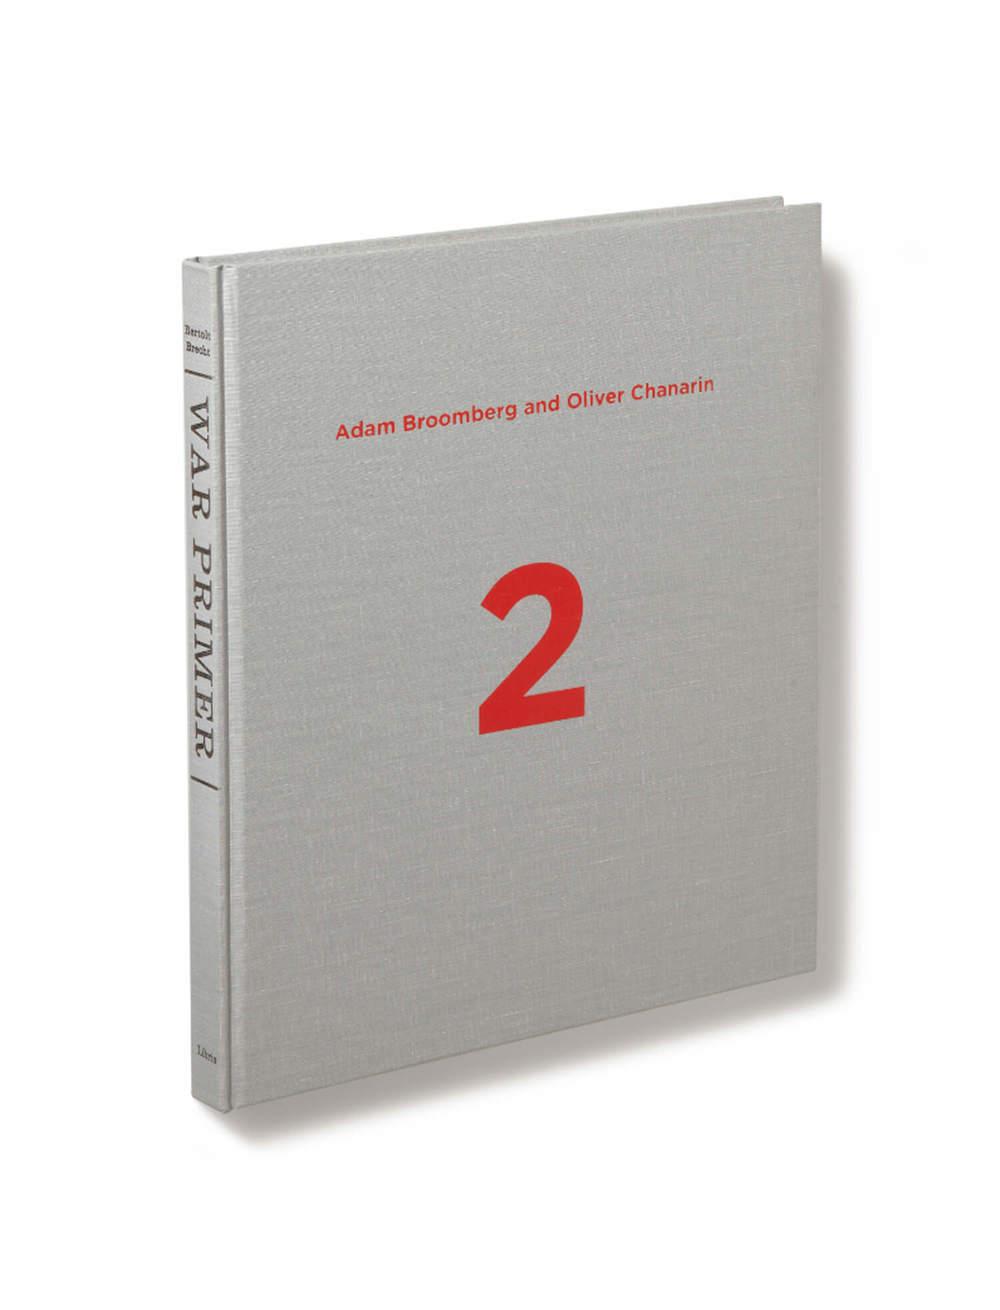 War Primer 2, Adam Broomberg & Oliver Chanarin, 2011, hardback book (MACK)